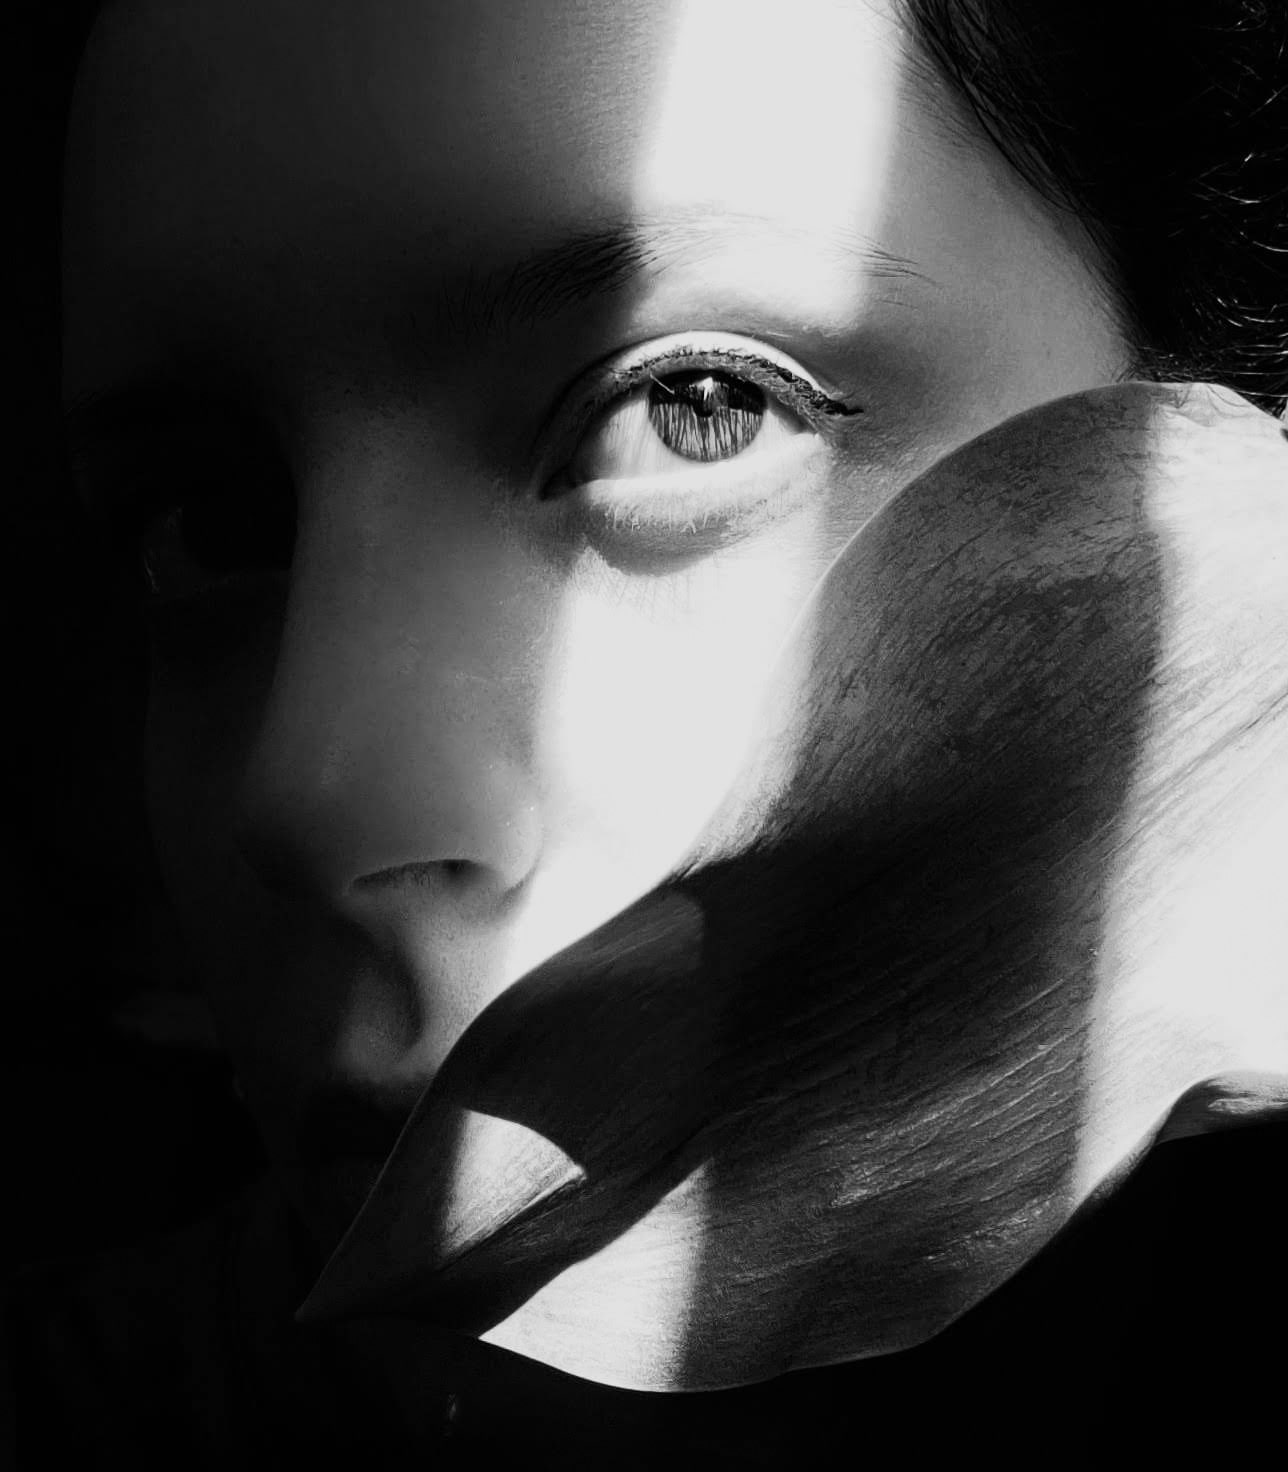 arianna-mauri-BnW Shadows- photoshoot con poca luce - portrait